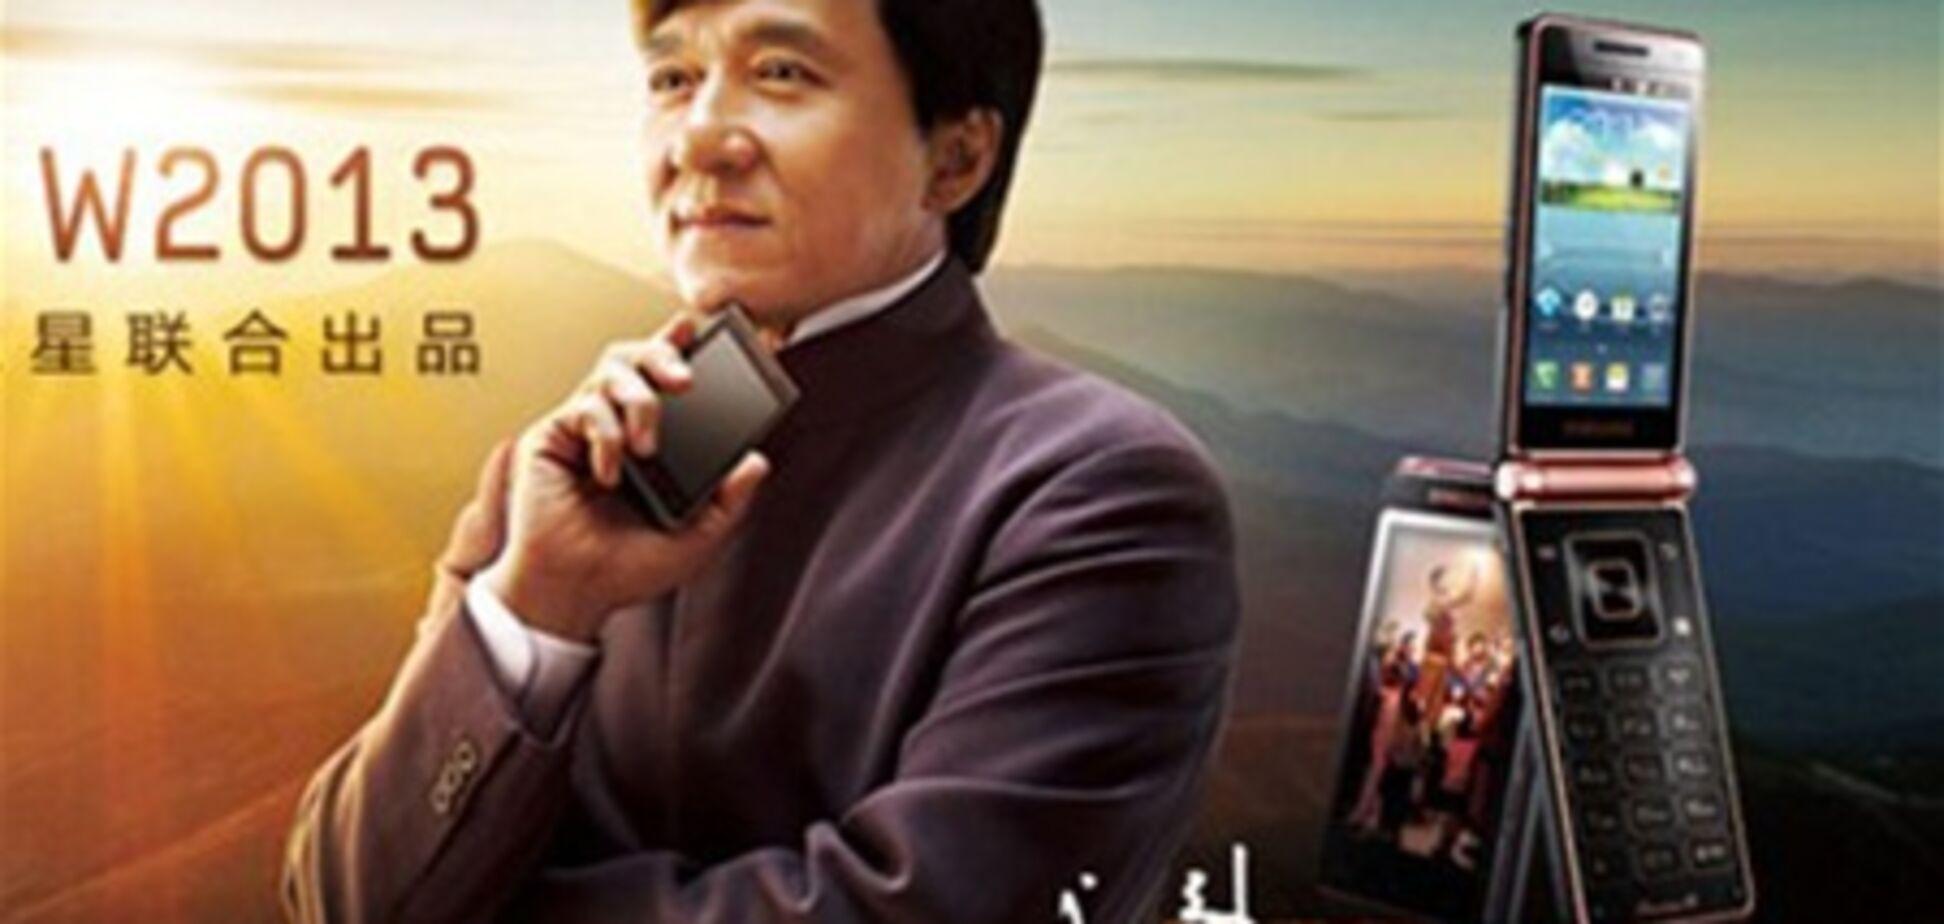 Джеки Чан представил в Китае телефон за $3000